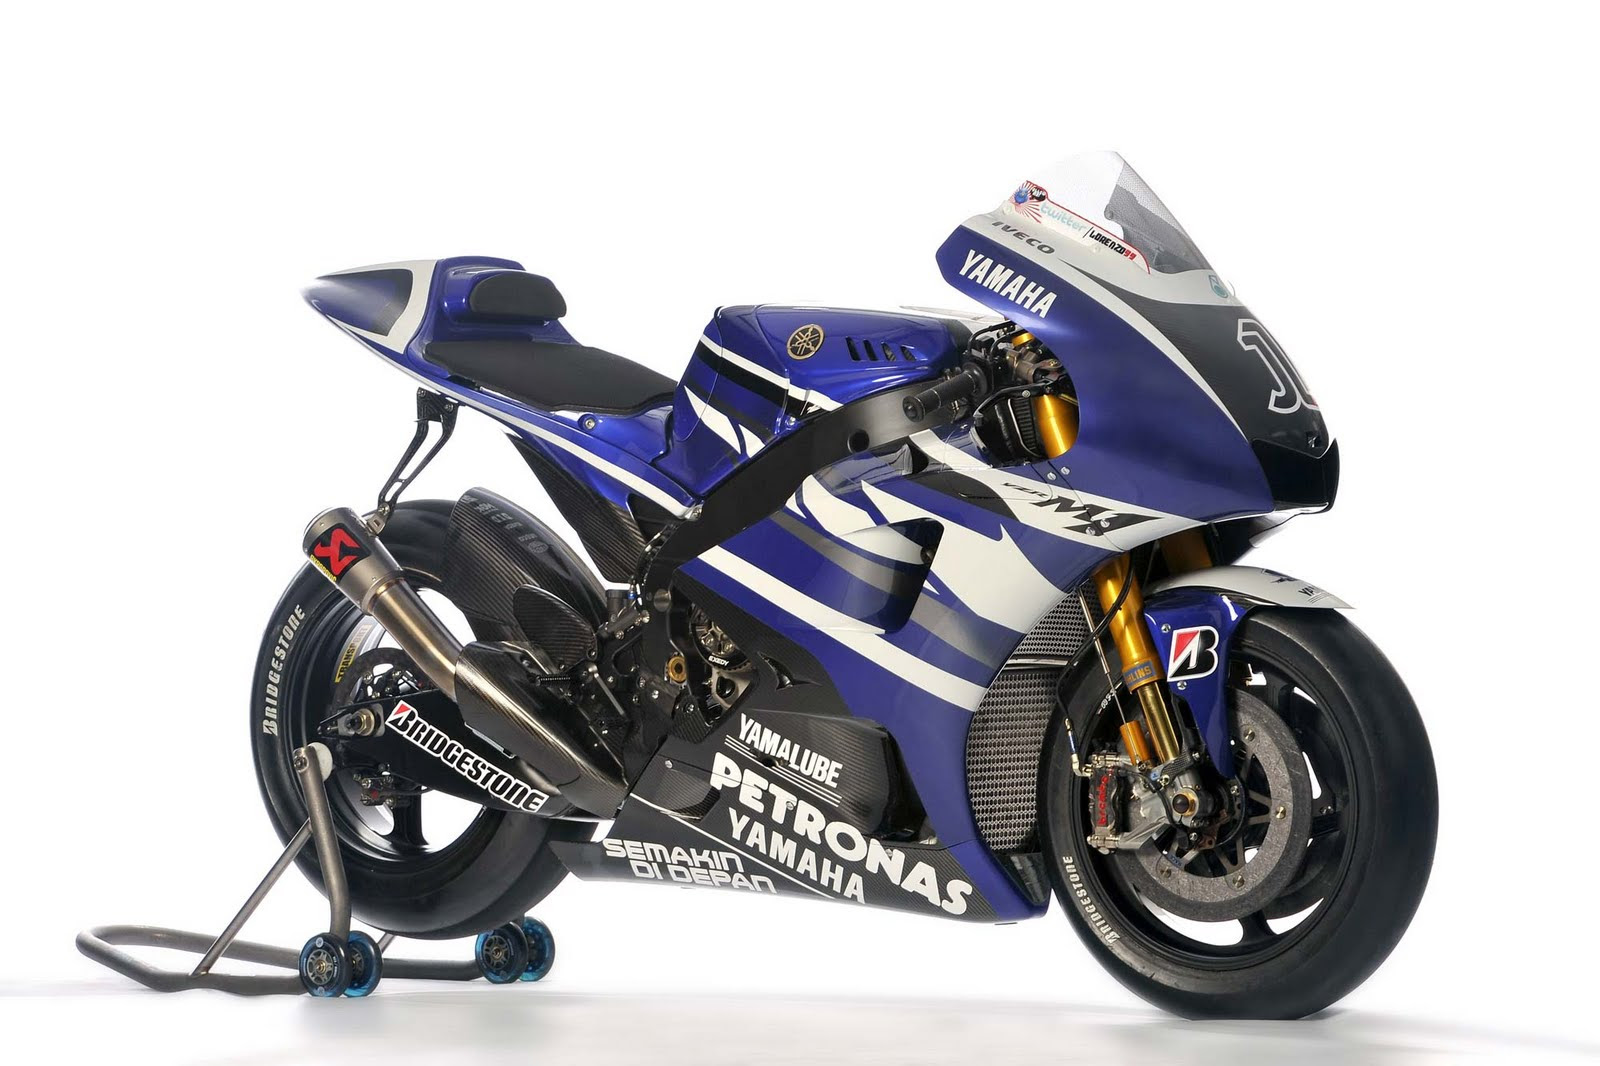 Top Motorcycle Wallpapers: 2011 Yamaha YZR-M1 MotoGP Pictures